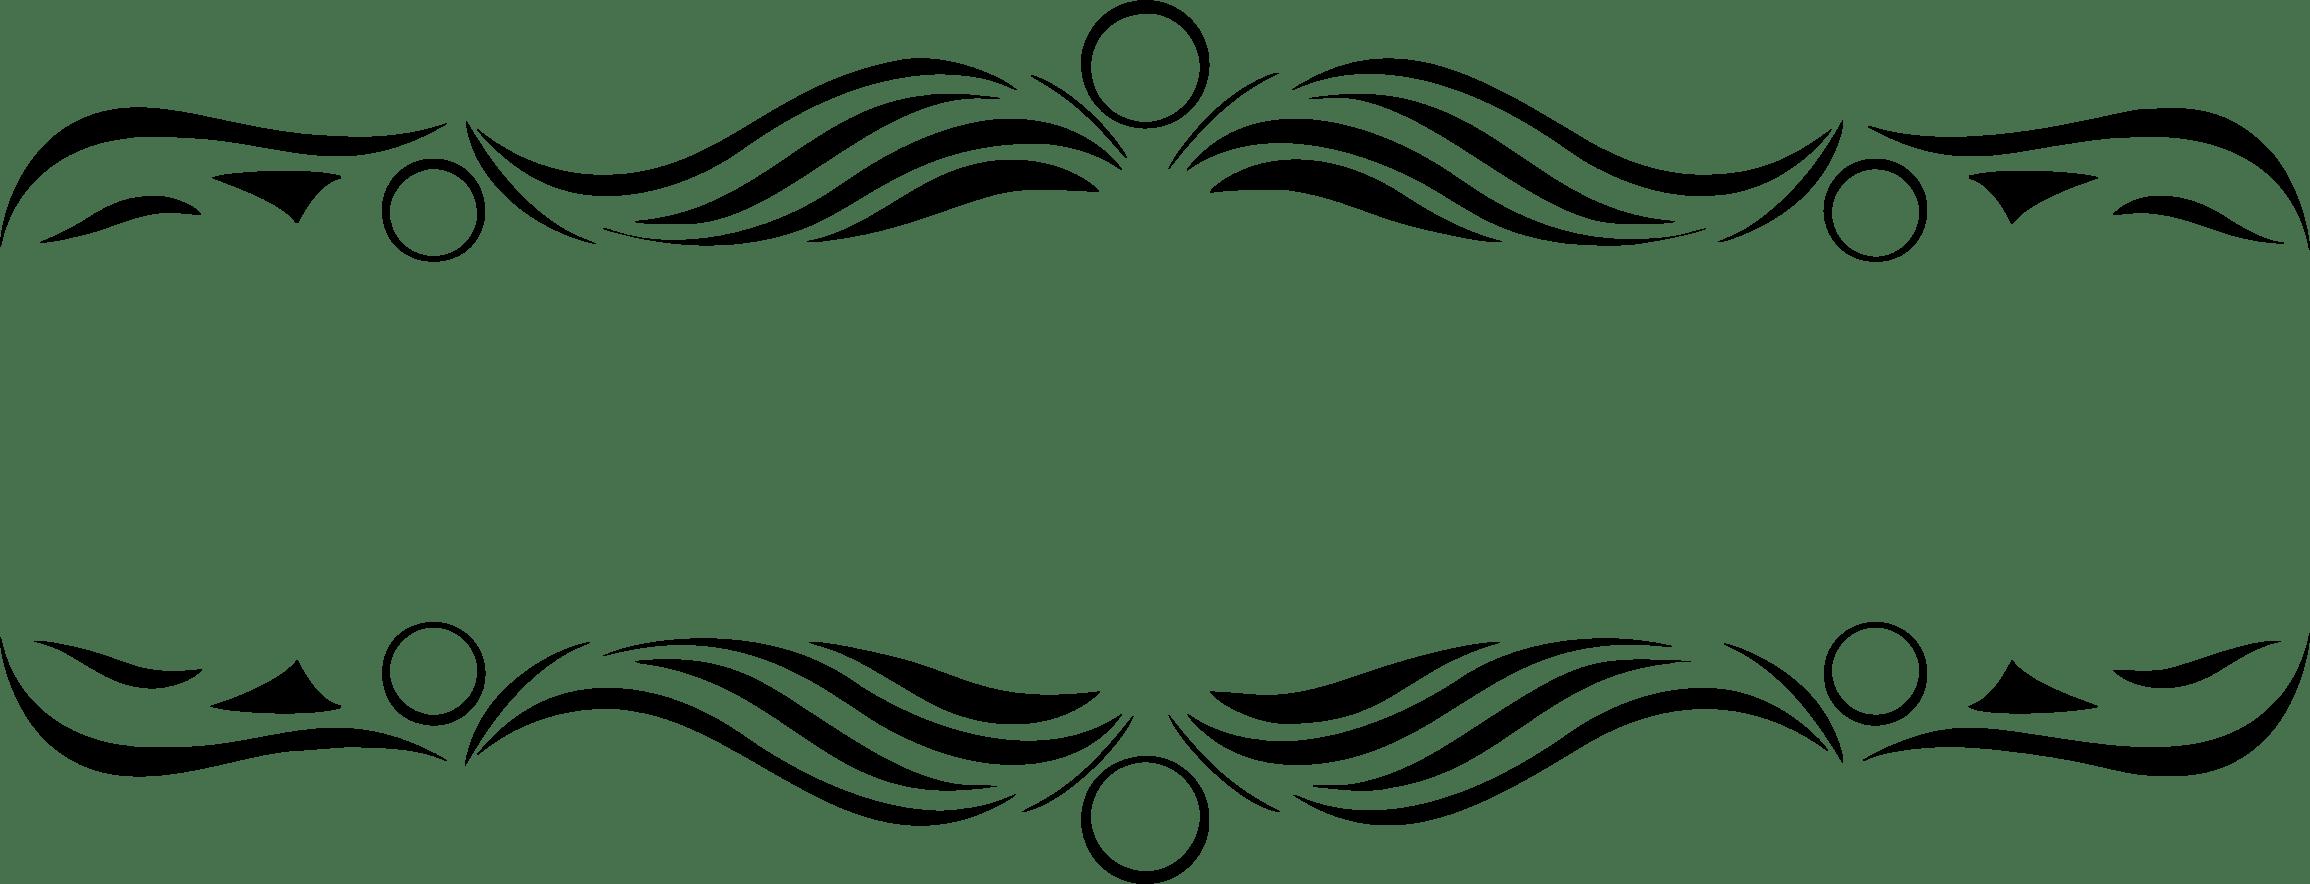 Lines Clipart Separator Lines Separator Transparent Free